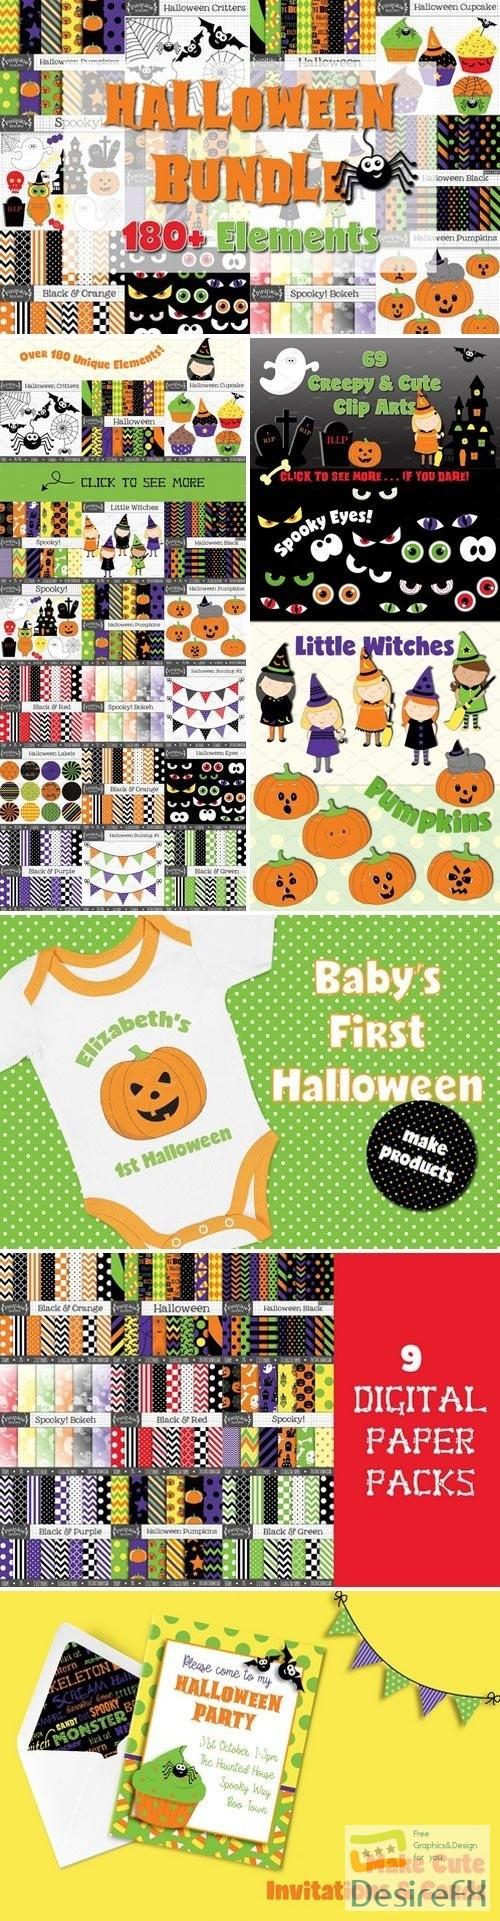 stock-images - Halloween Graphics Bundle 2779000